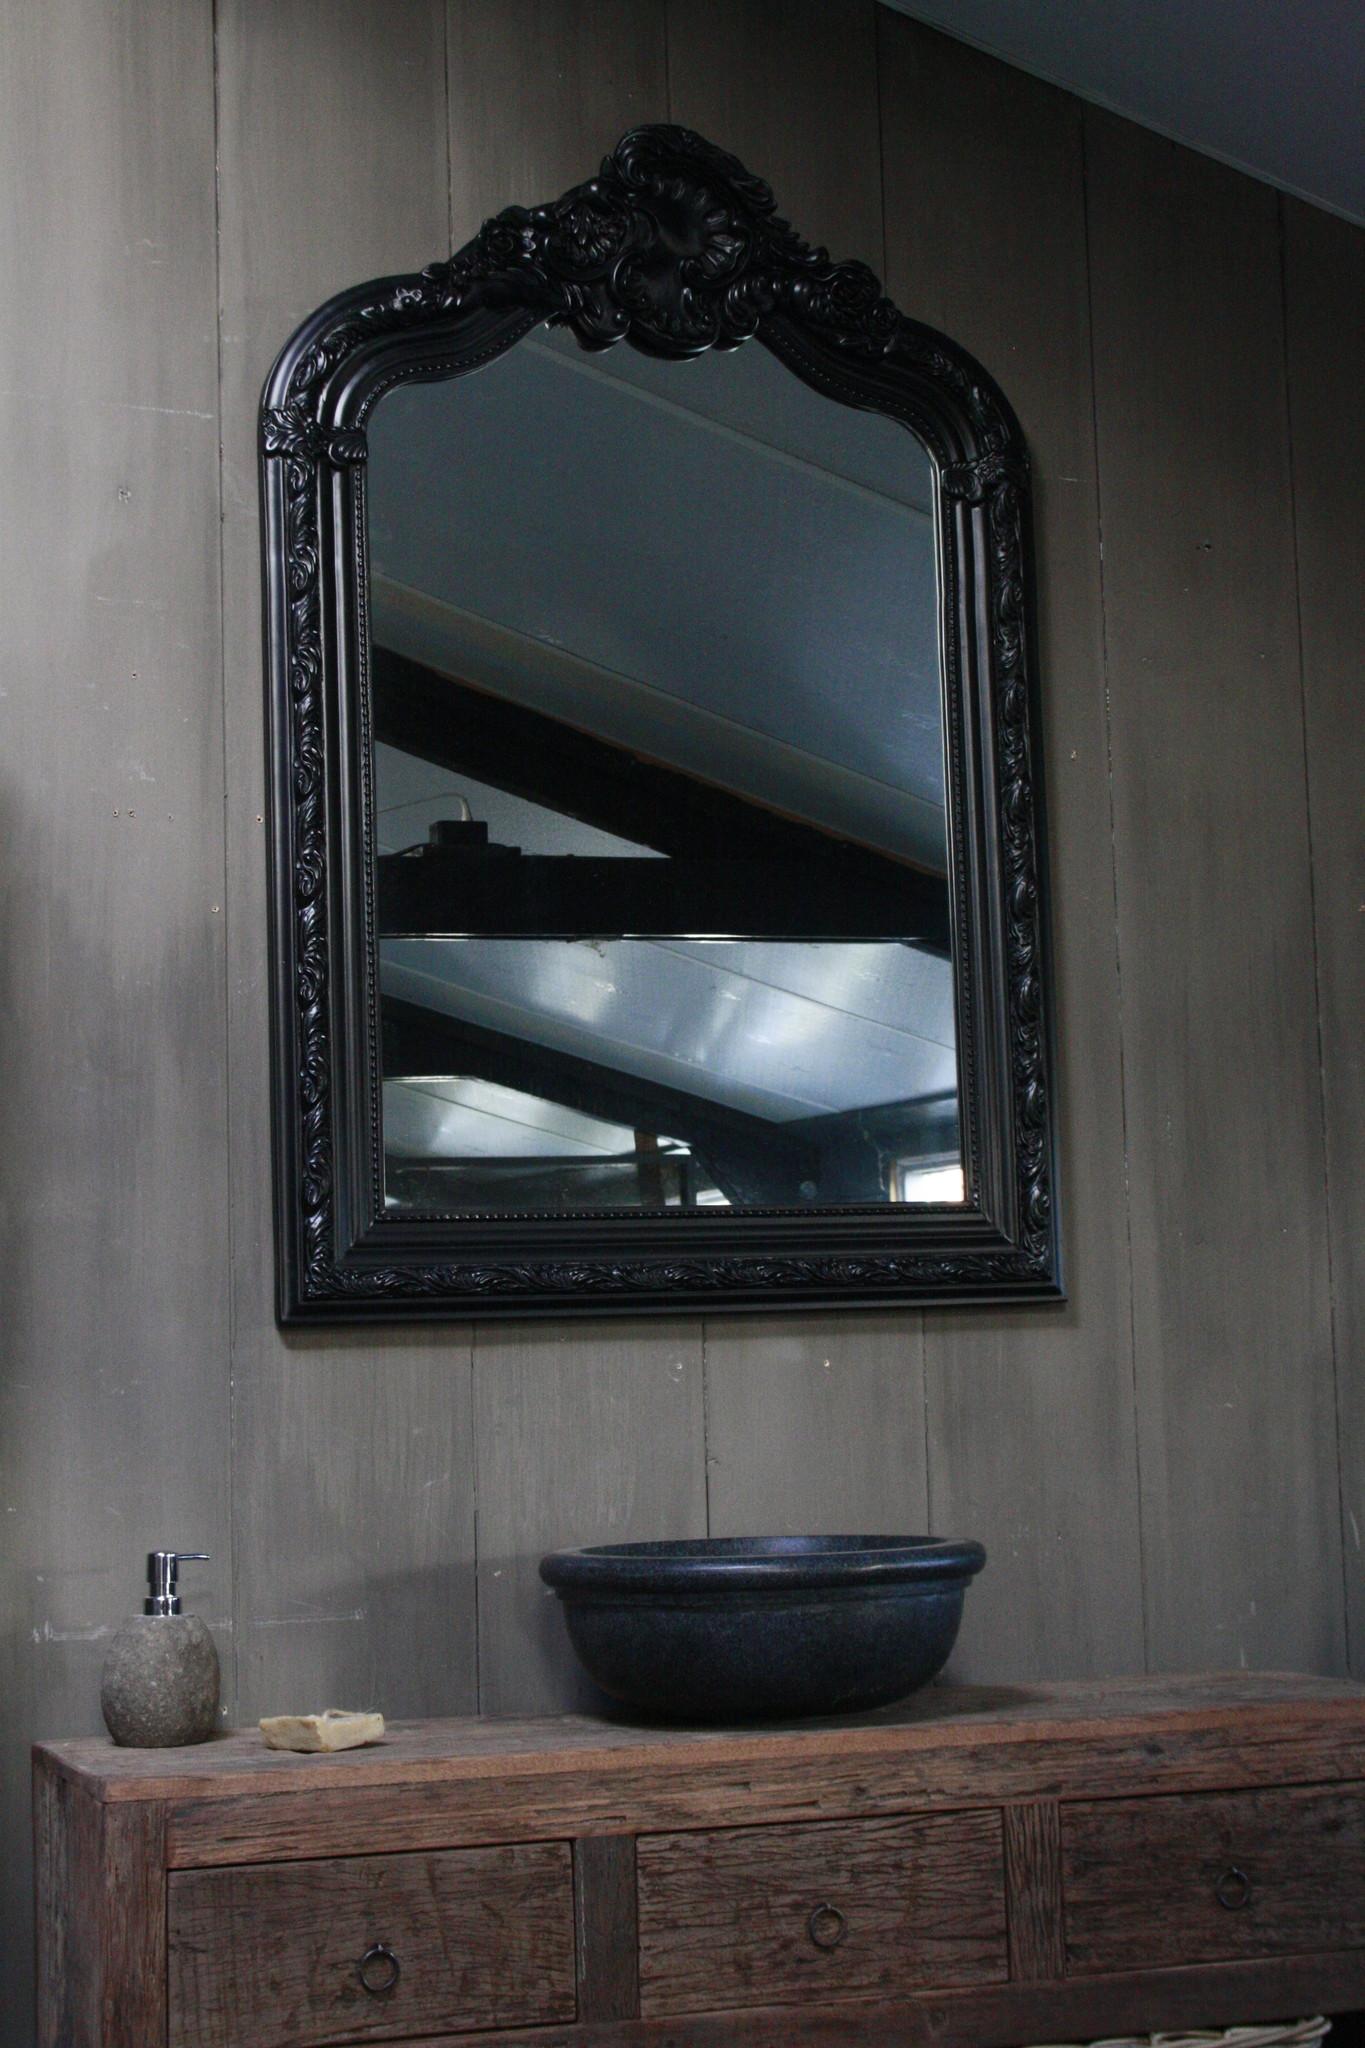 Kuifspiegel Barok Roma Black 117 x 80 cm-2